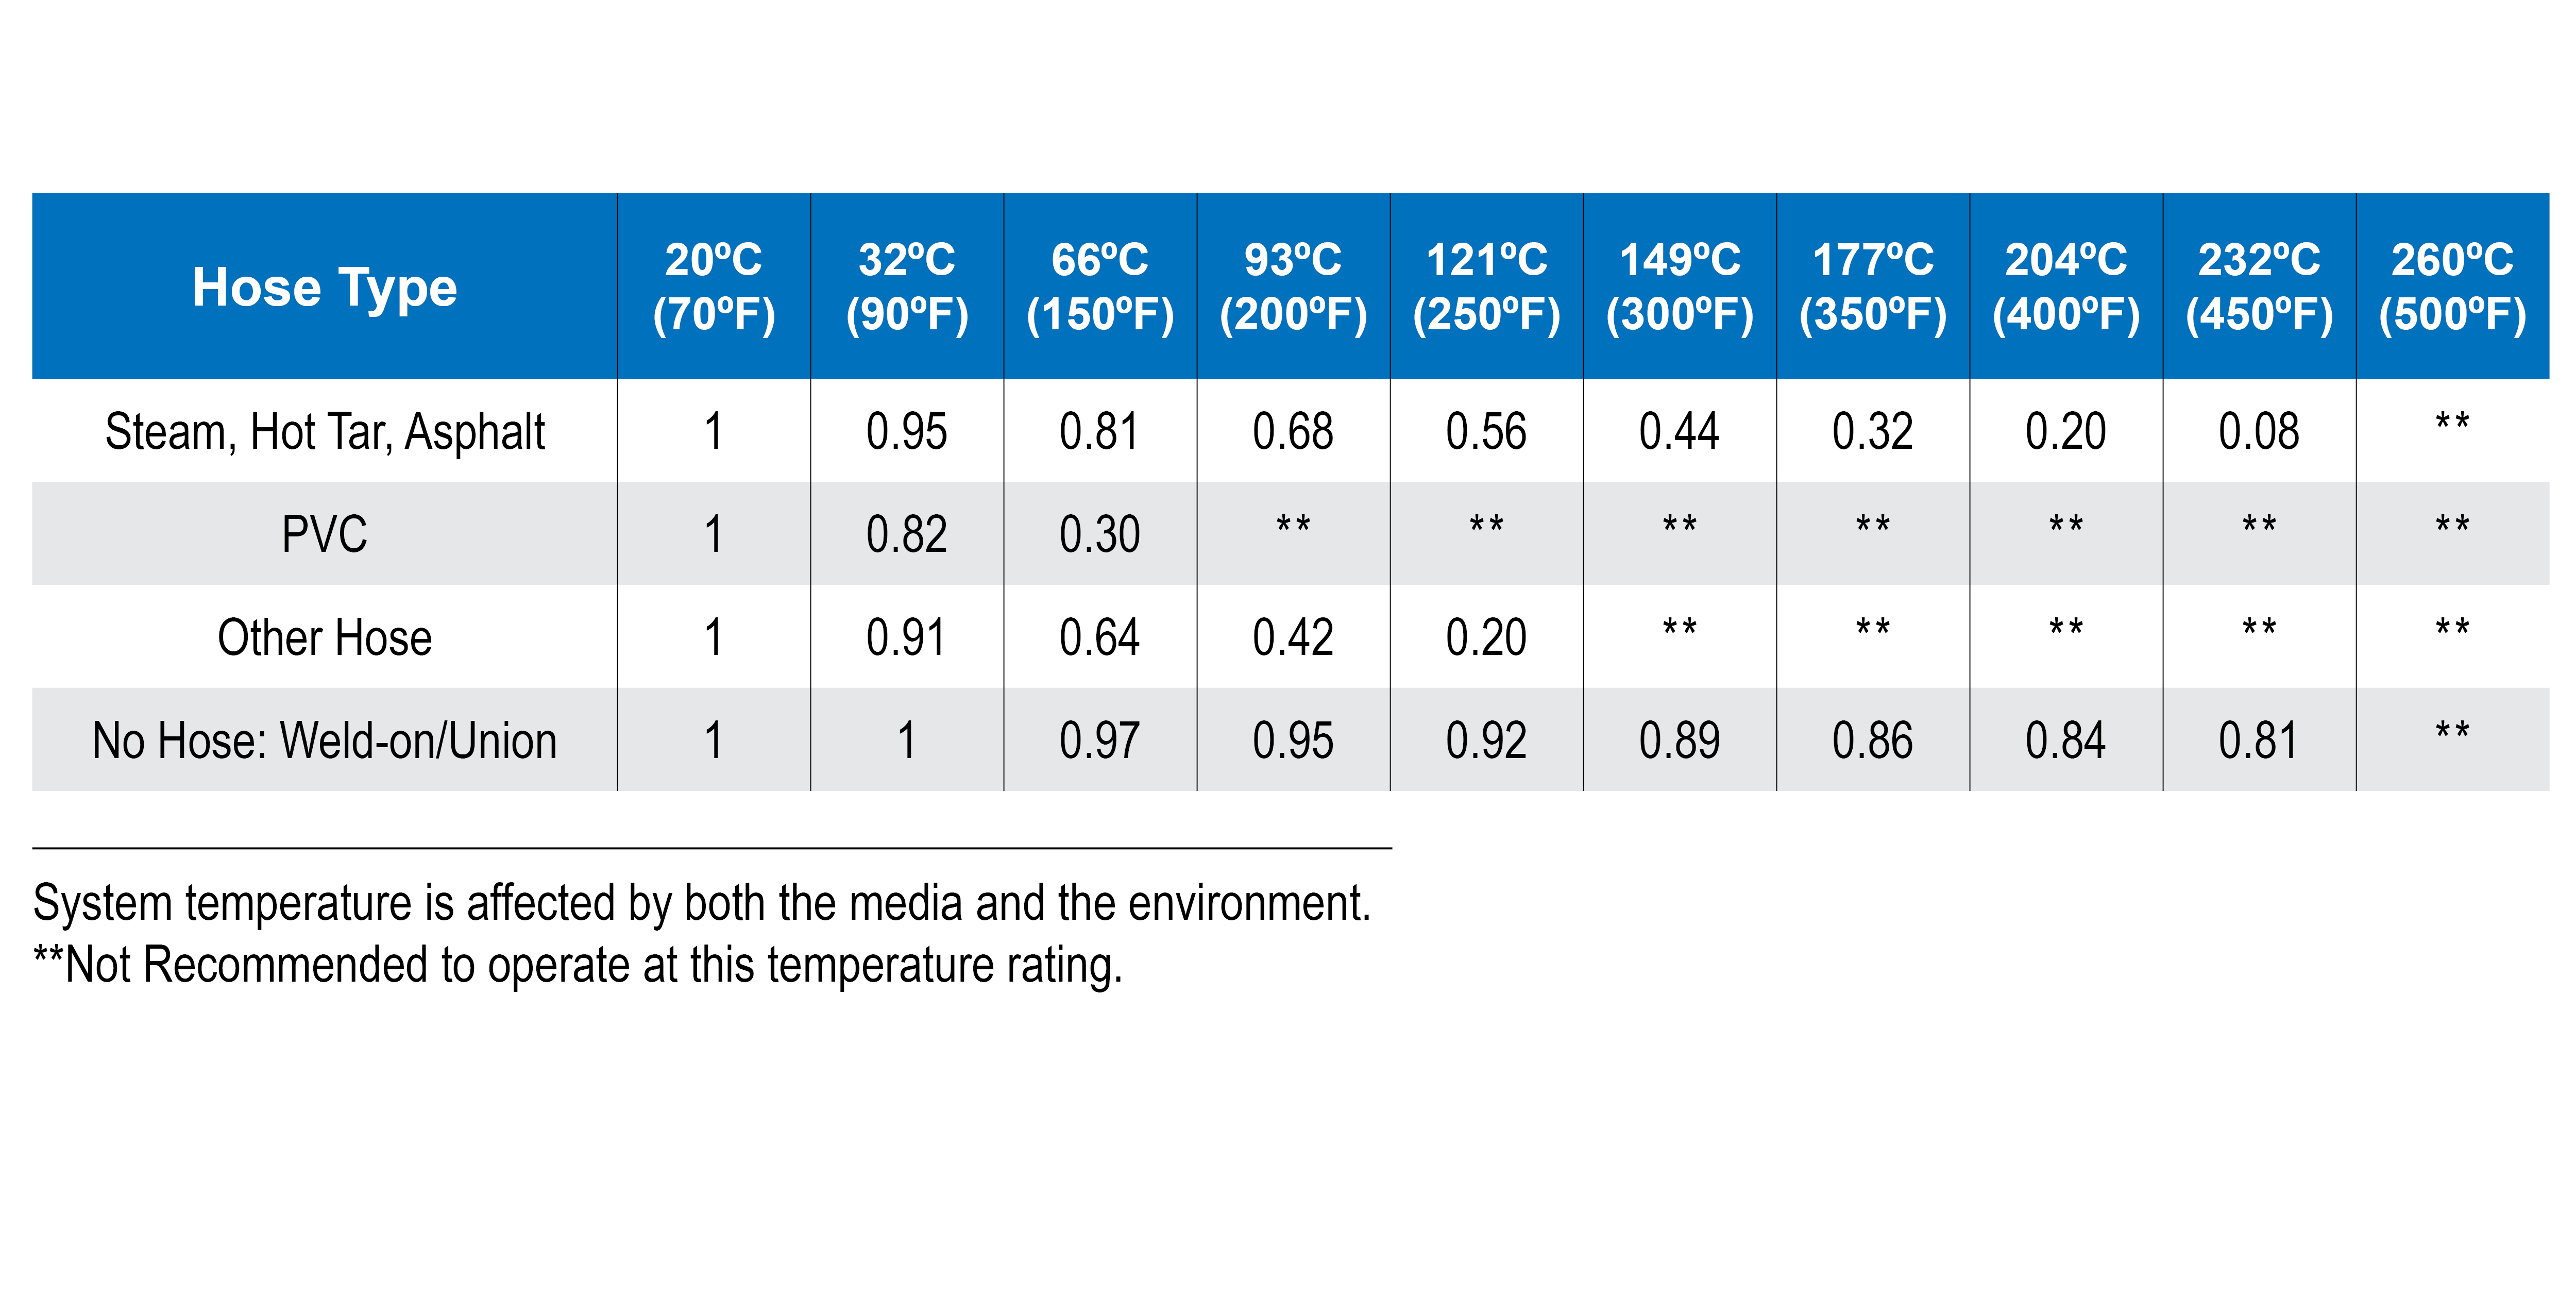 Hydraulic Hose Temperature Rating